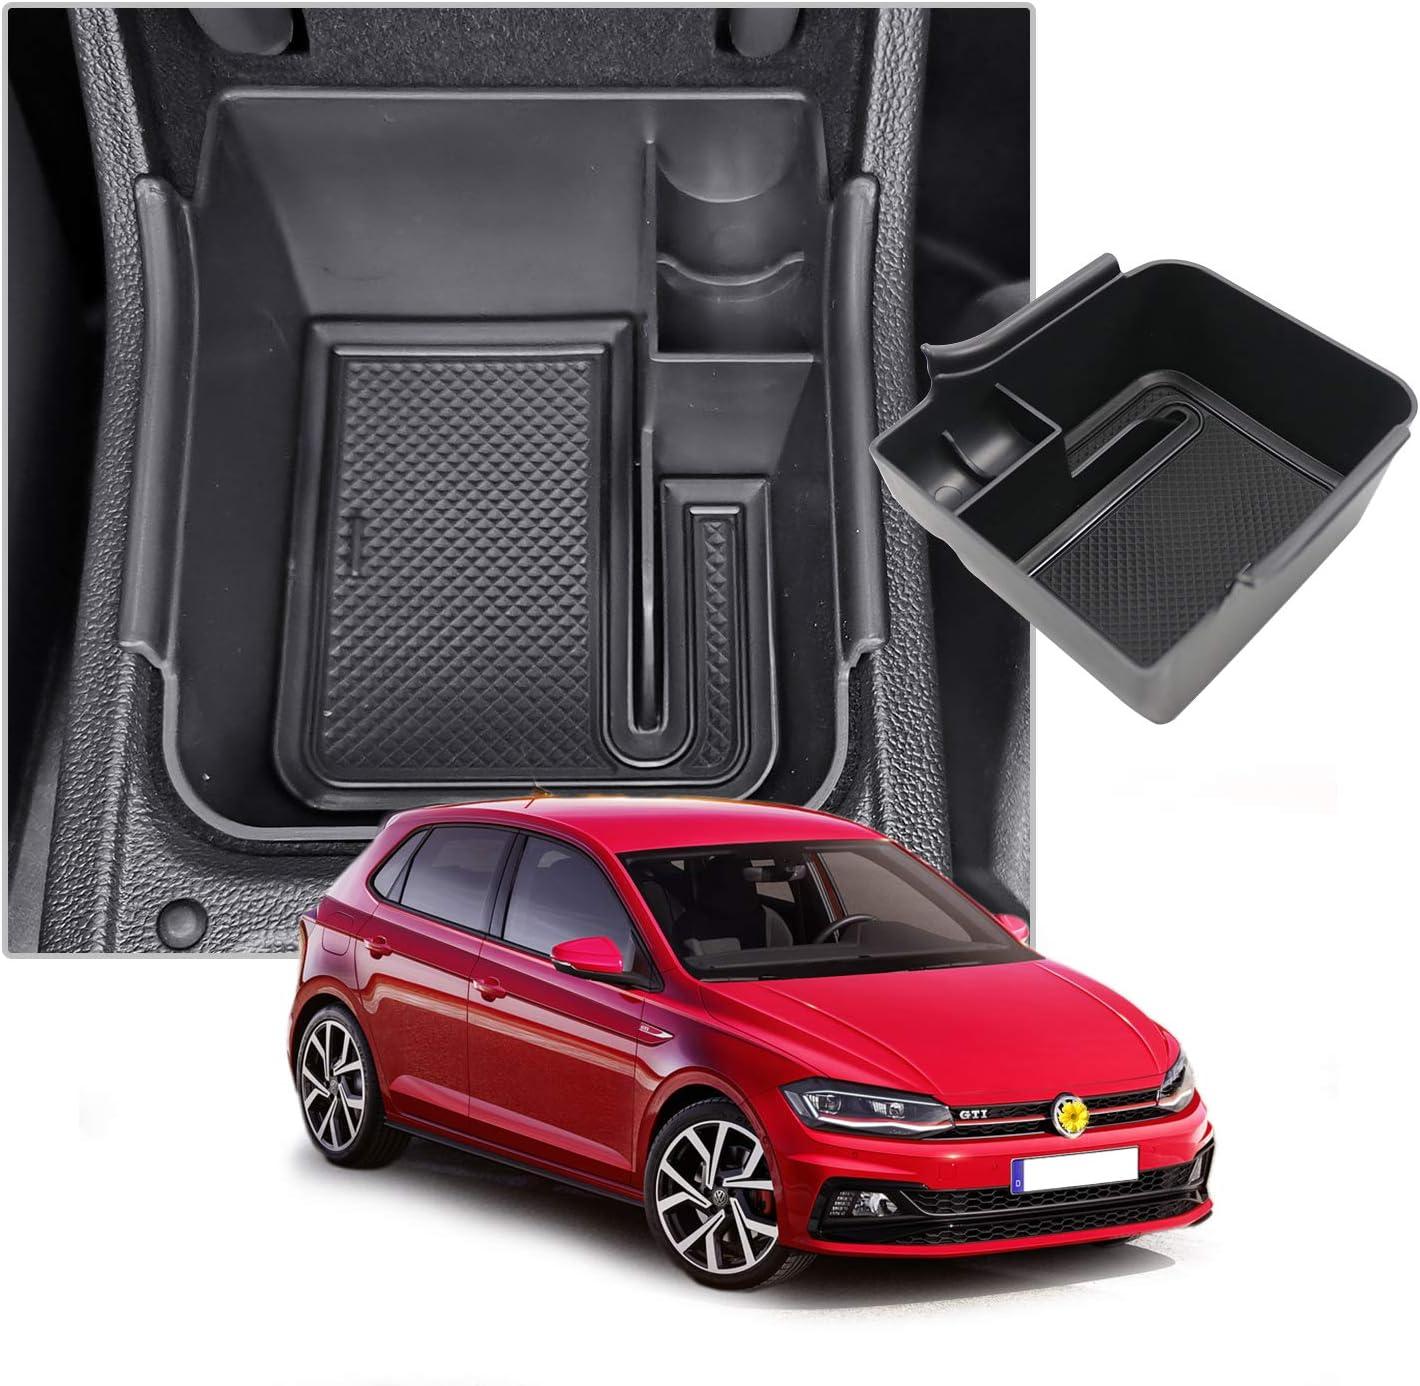 Consola Central Apoyabrazos Caja del coche Interior Center Armrest Storage Box Con Tapete Antideslizante Accesorios Interiores del coche CDEFG para V W Polo 2018-2020 Caja de almacenamiento